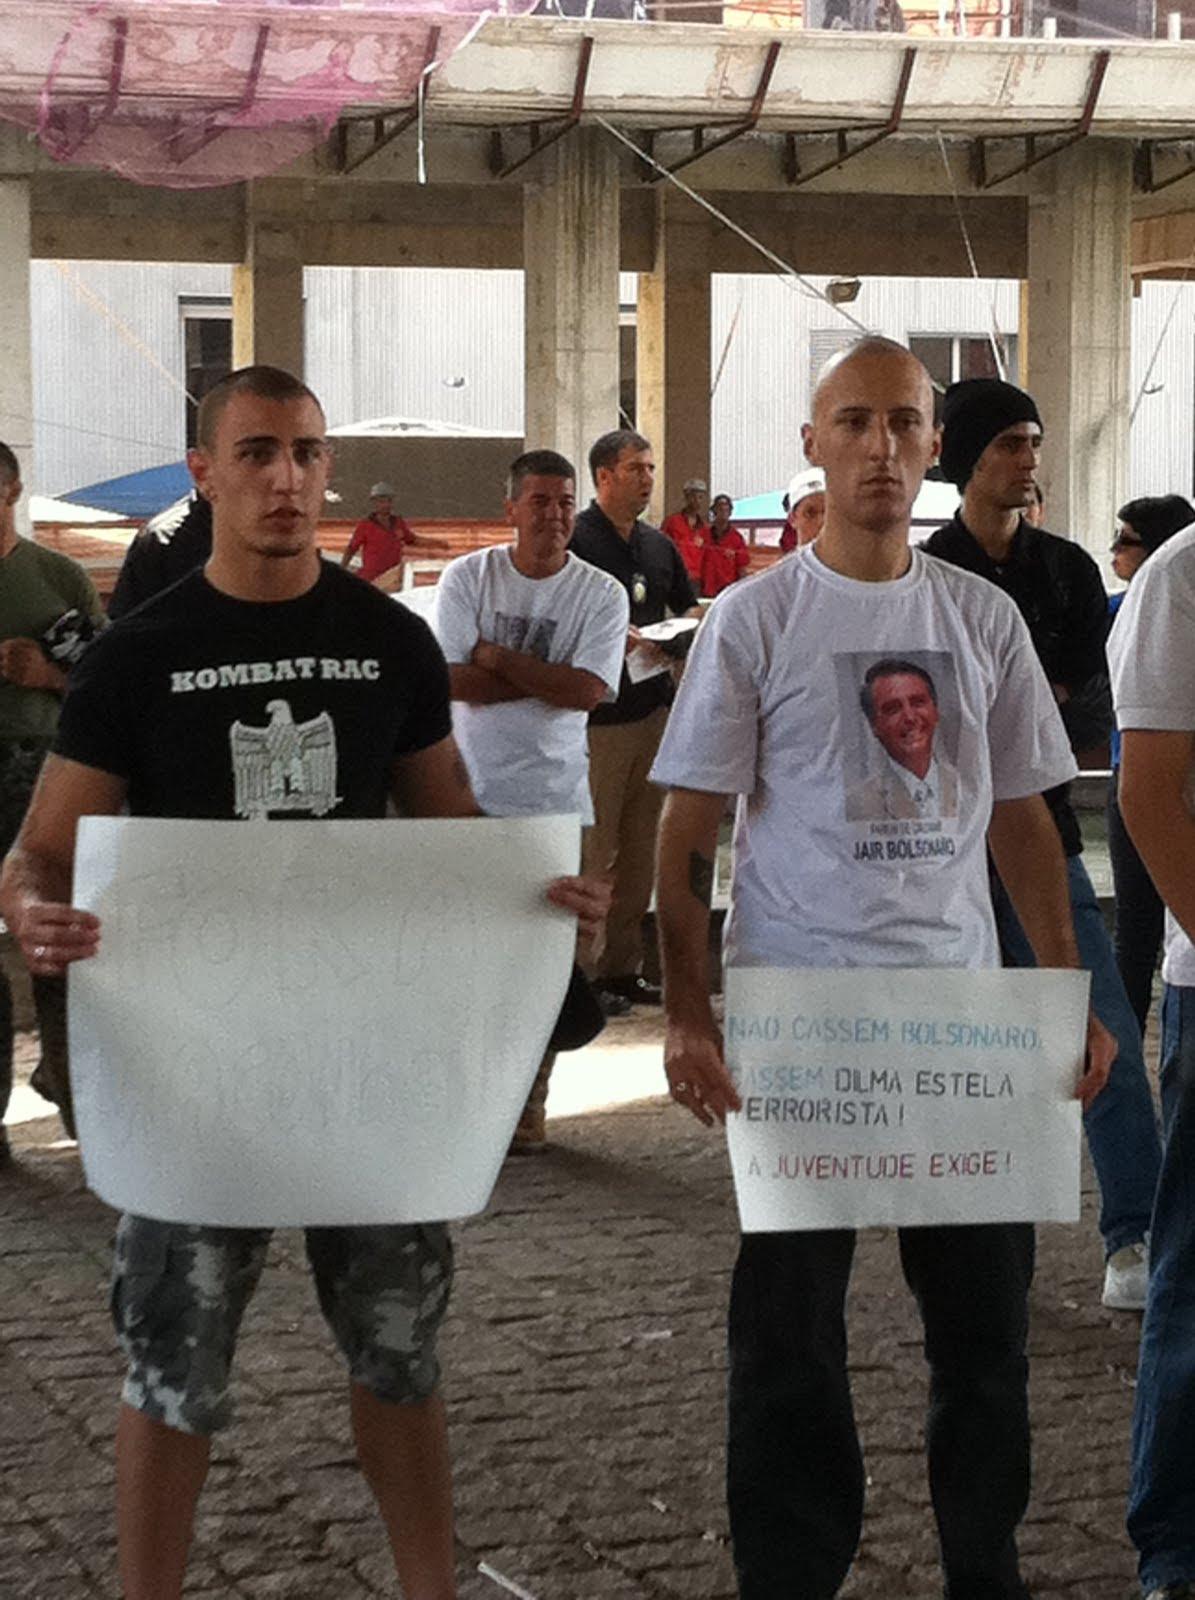 O protesto dos neonazistas na Paulista em defesa de Bolsonaro | Quebrando Tabus